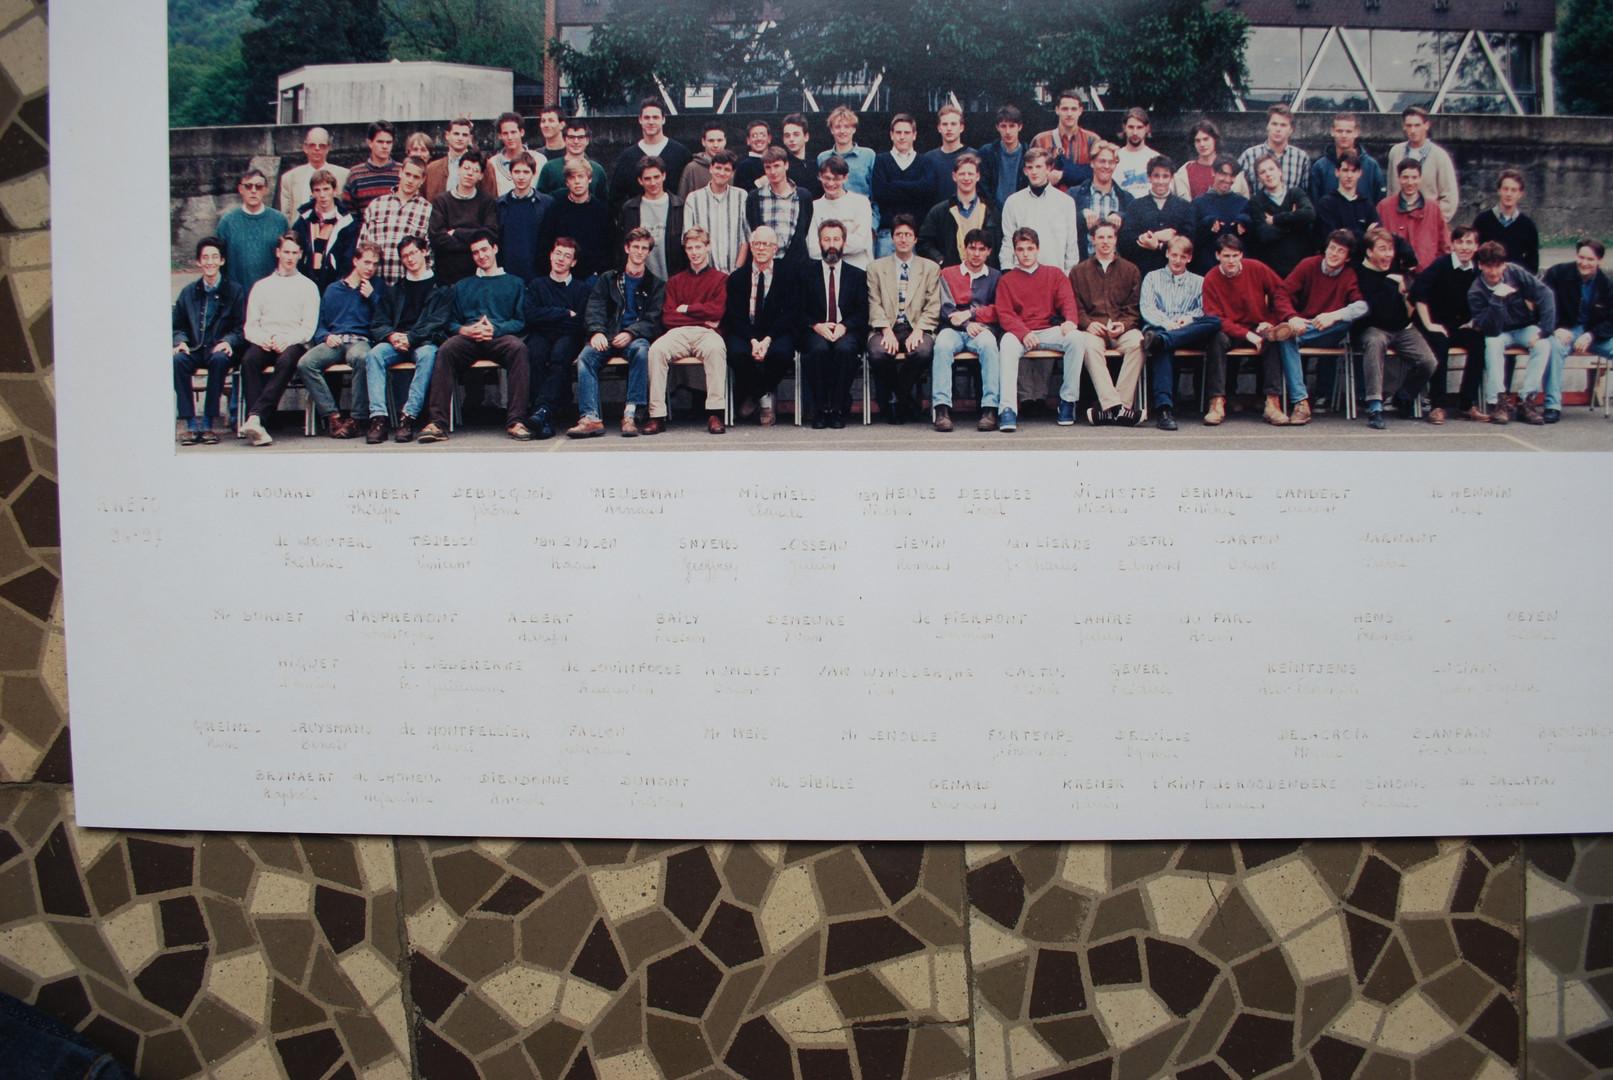 1996-1997-O'.JPG